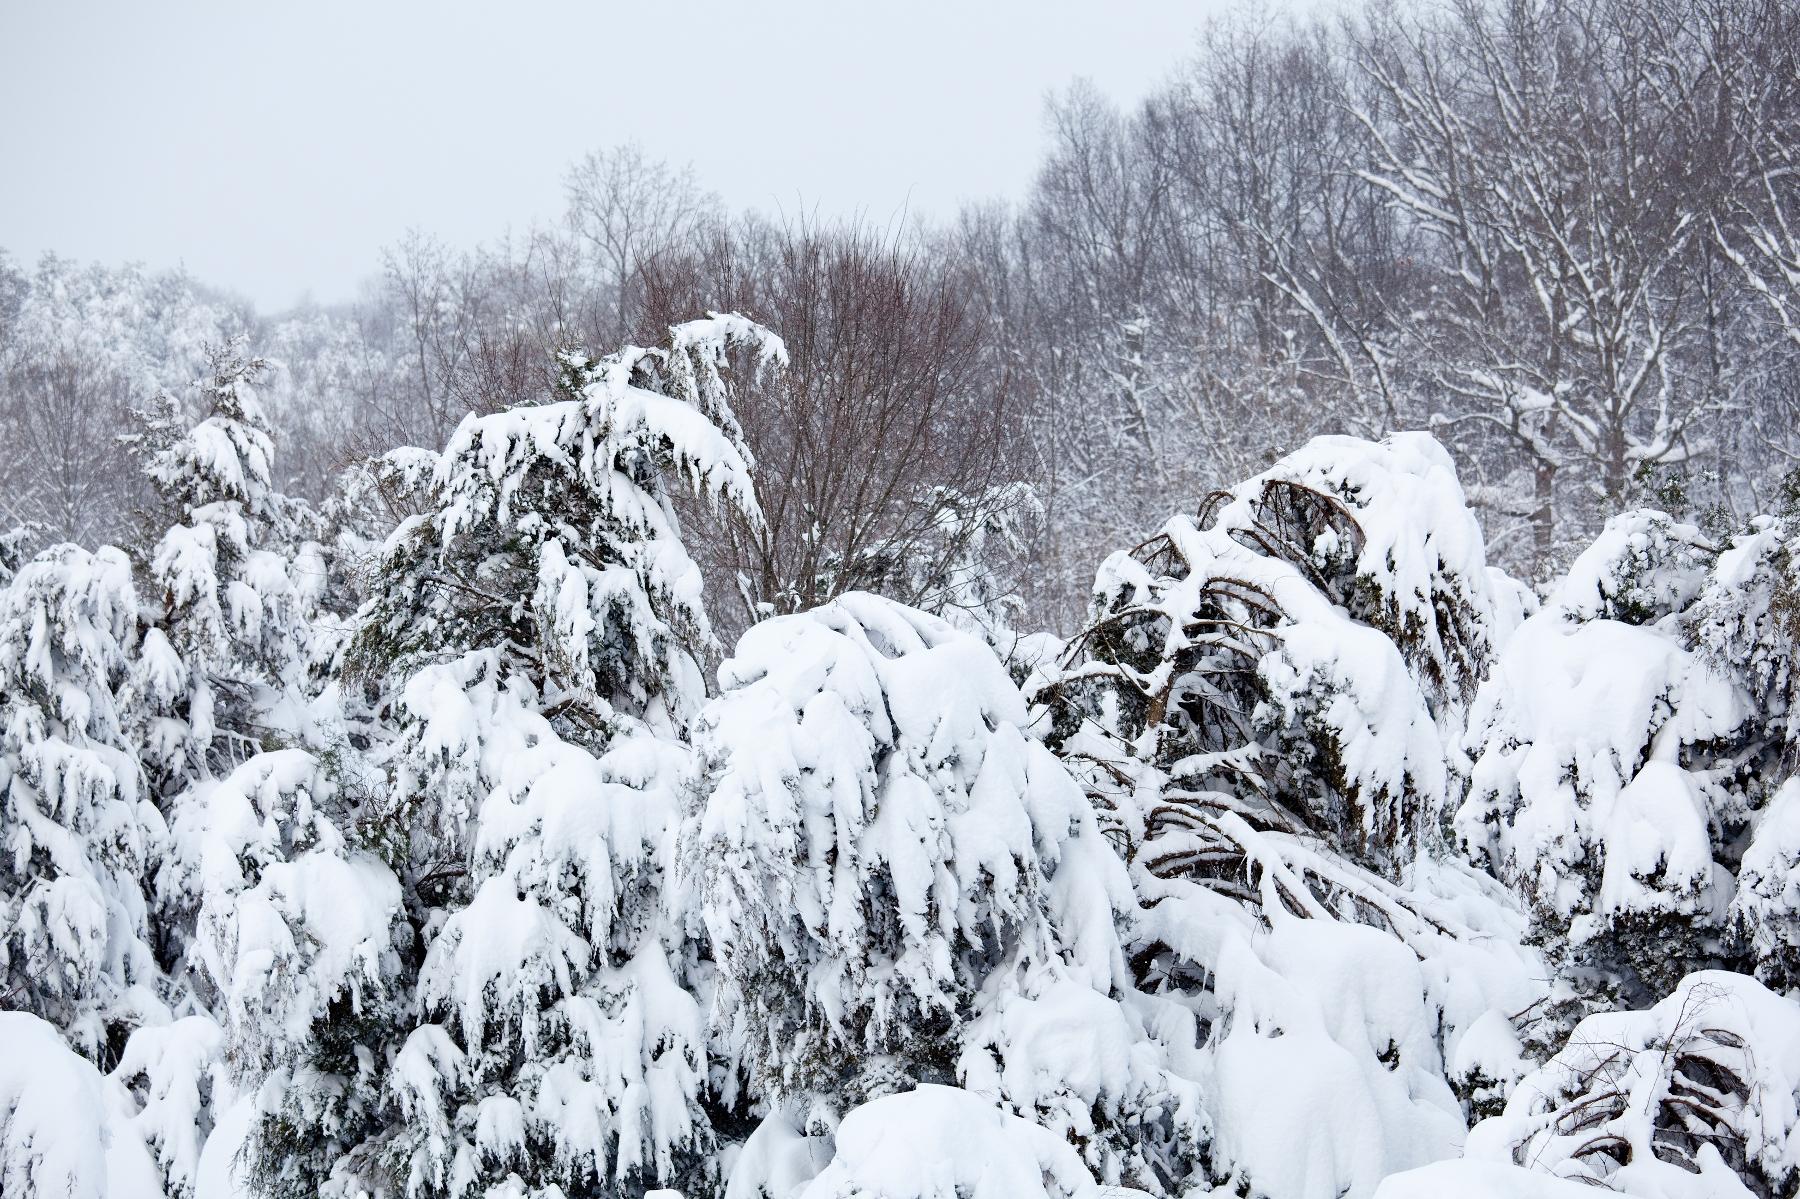 Snowy Plants - Garden & Greenhouse